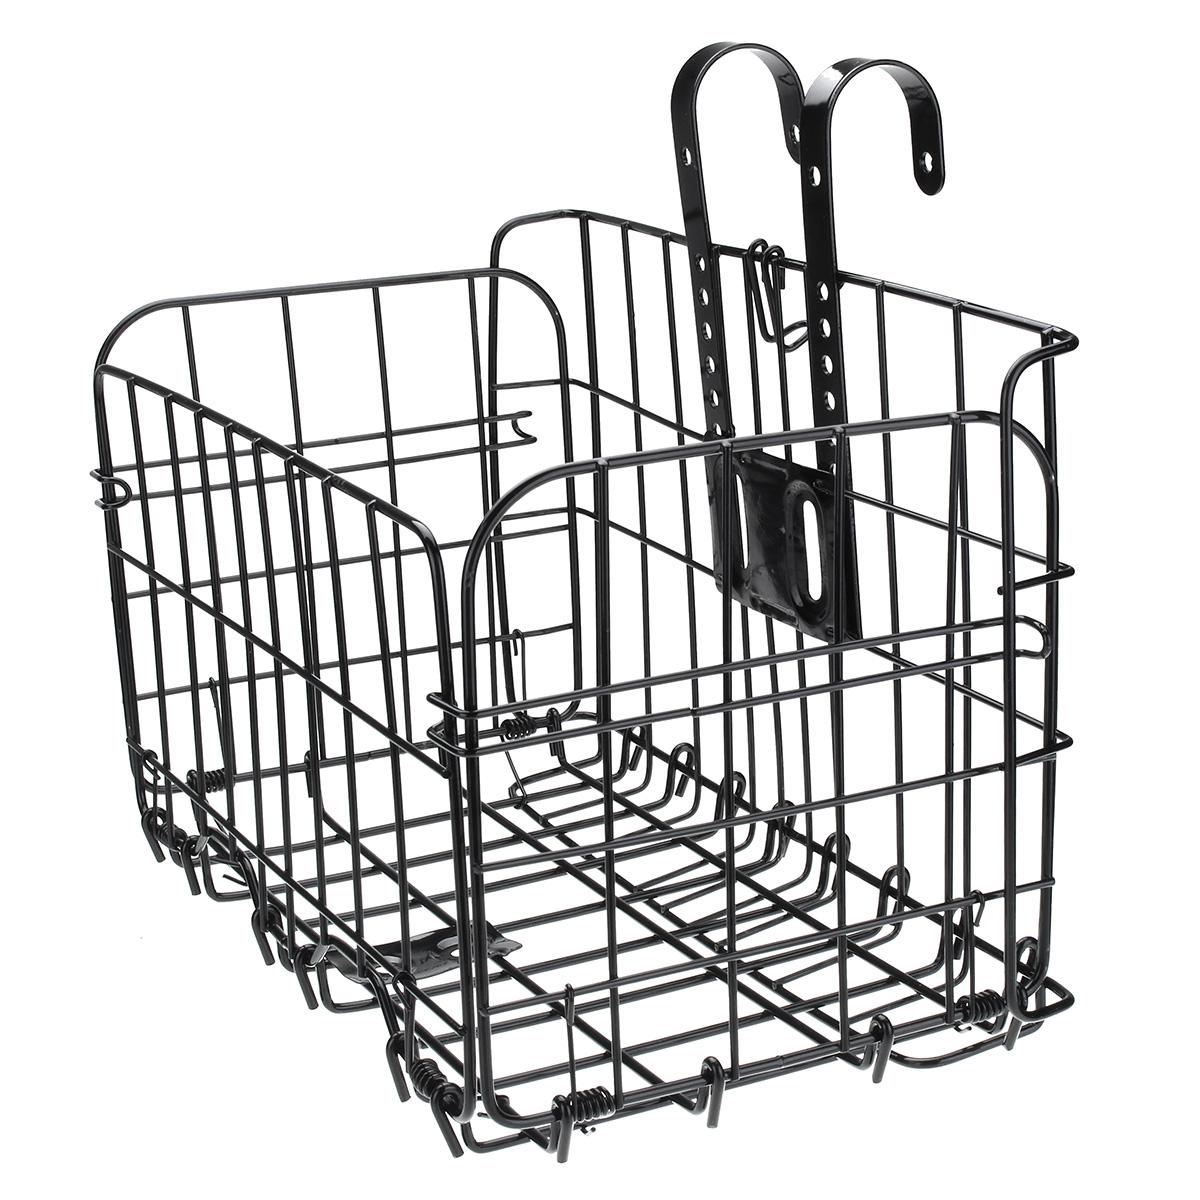 BIKIGHT Bicycle Front Basket Mesh Lift Off Carrier BLACK